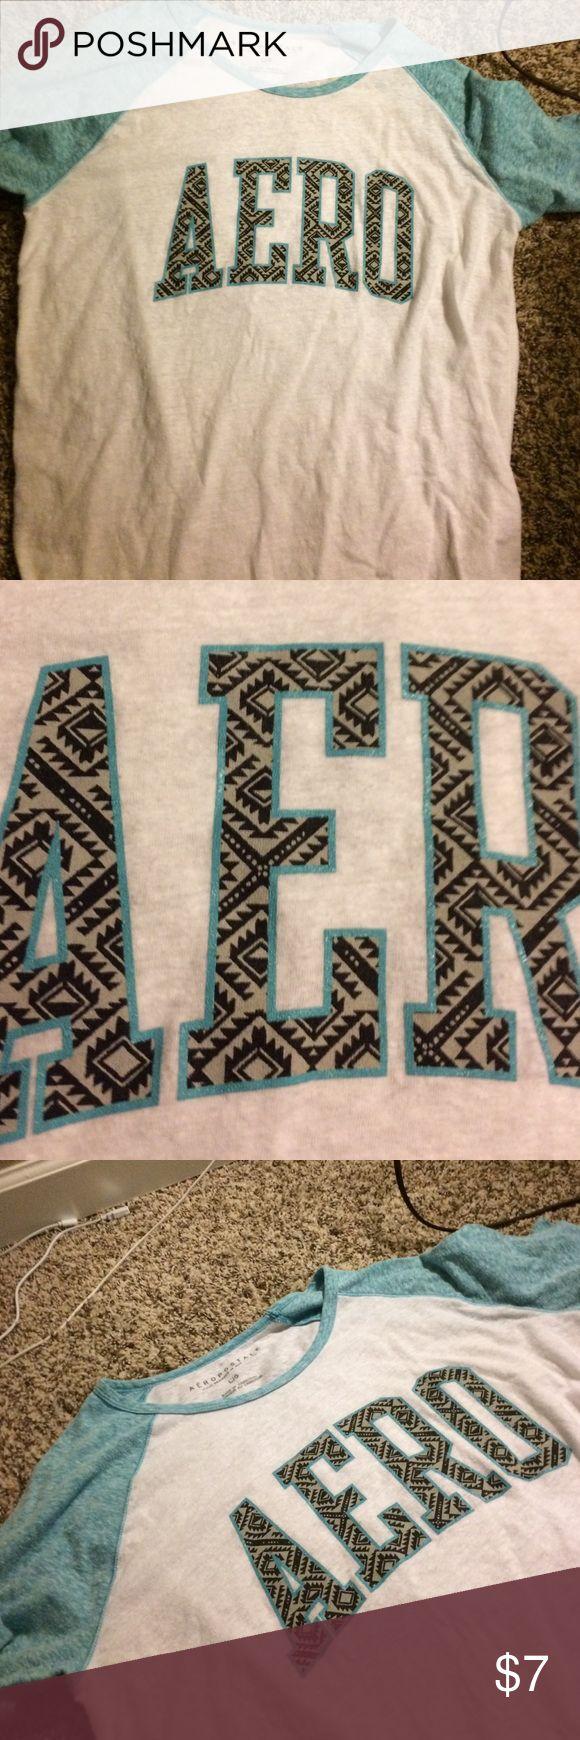 aero shirt short sleeve blue and white aero shirt Aeropostale Tops Tees - Short Sleeve